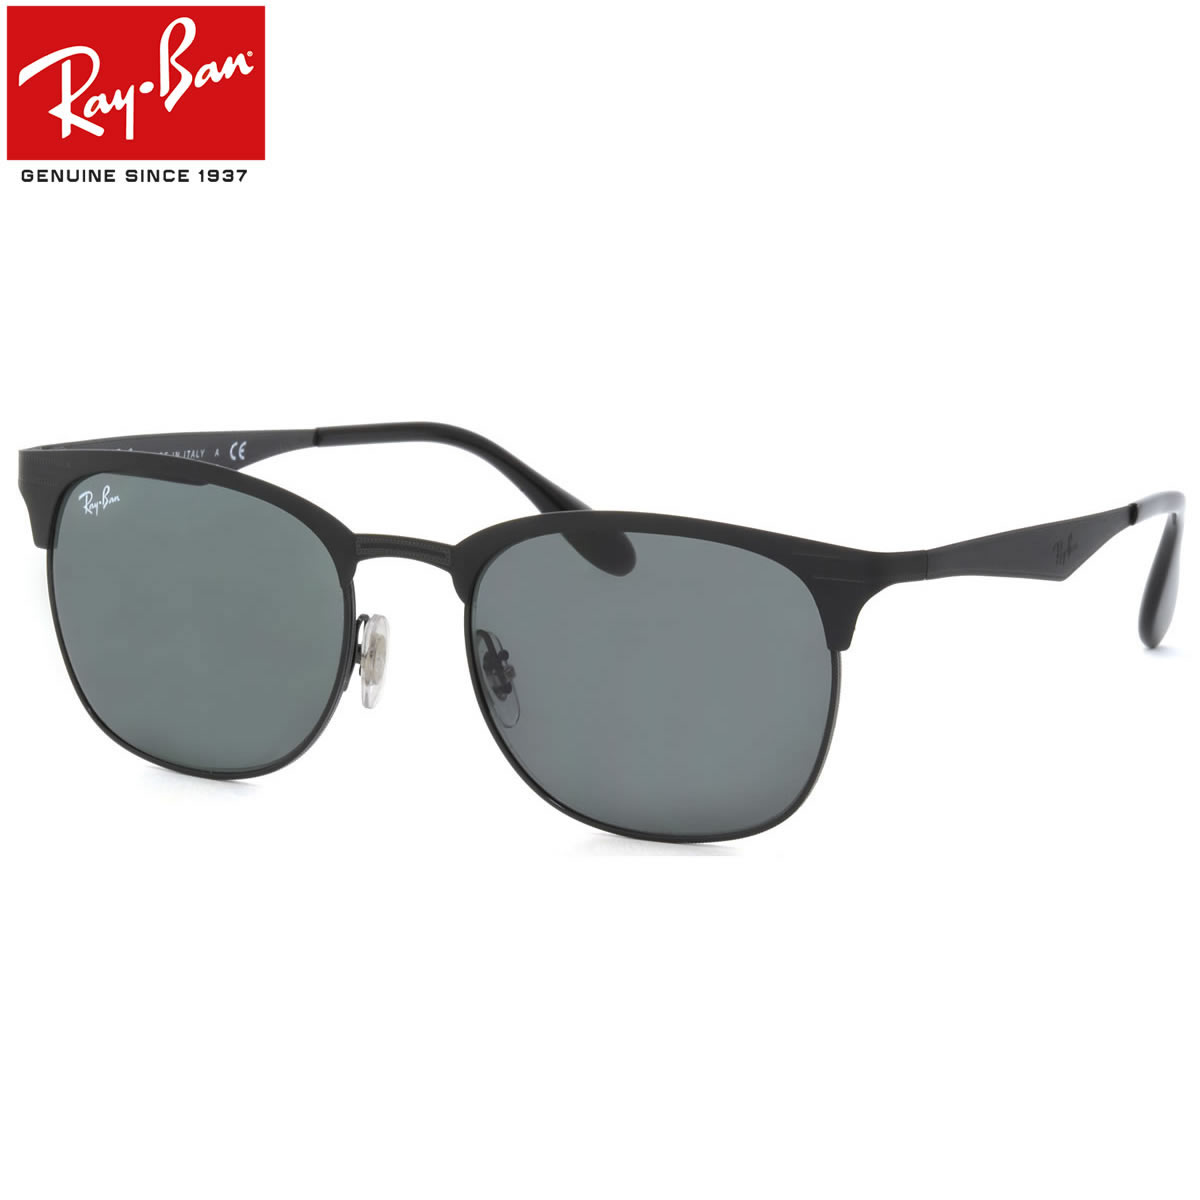 Ray Ban Rb 3538 186/71 9hkO1ty